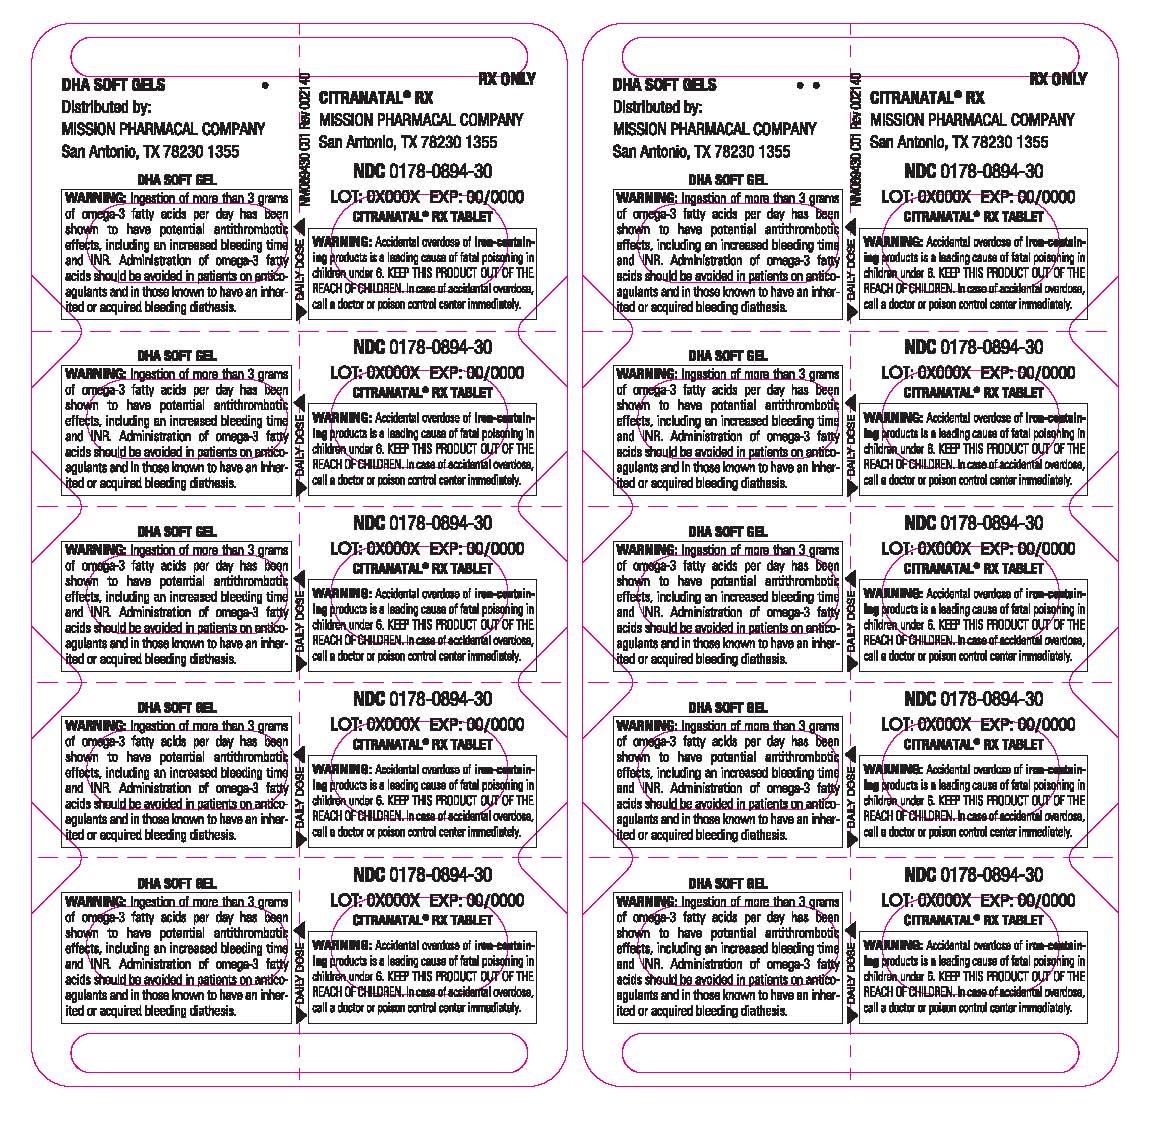 Citranatal Dha (Vitamin C, Calcium, Iron, Vitamin D3, Vitamin E, Thiamin, Riboflavin, Niacinamide, Vitamin B6, Folic Acid, Iodine, Zinc, Copper, Docusate Sodium) Kit [Mission Pharmacal Company]